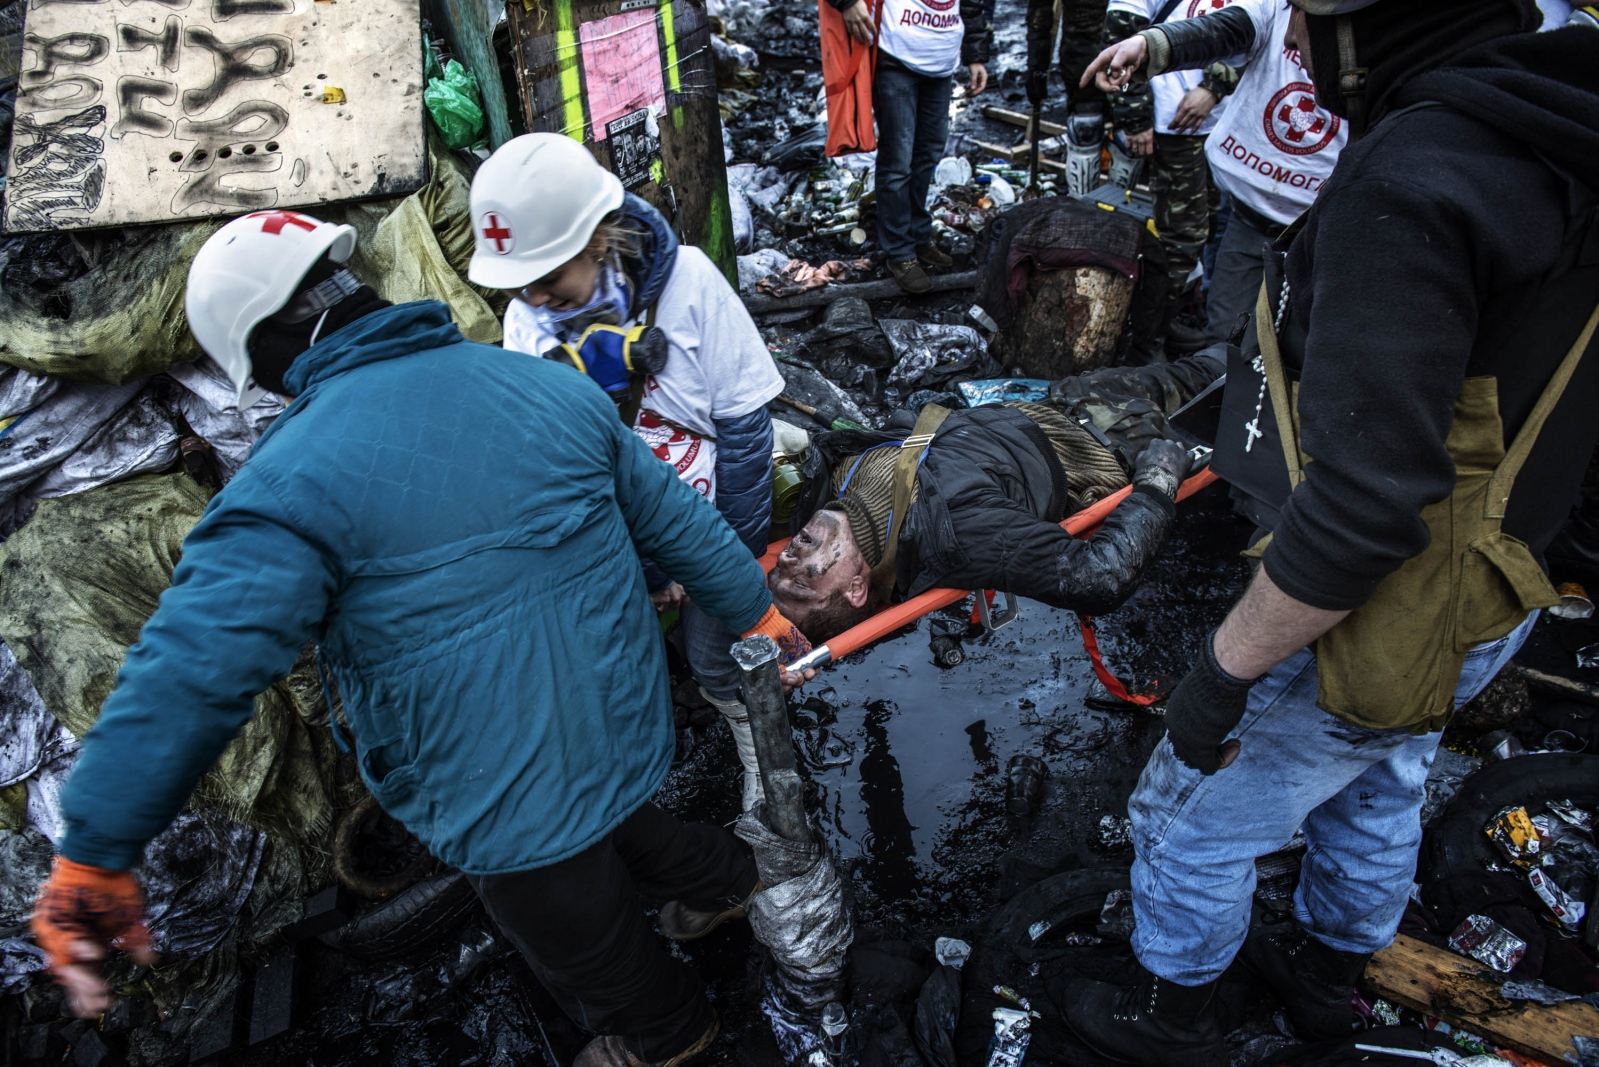 Art and Documentary Photography - Loading Behind_Kiev_s_barricades_019.jpg